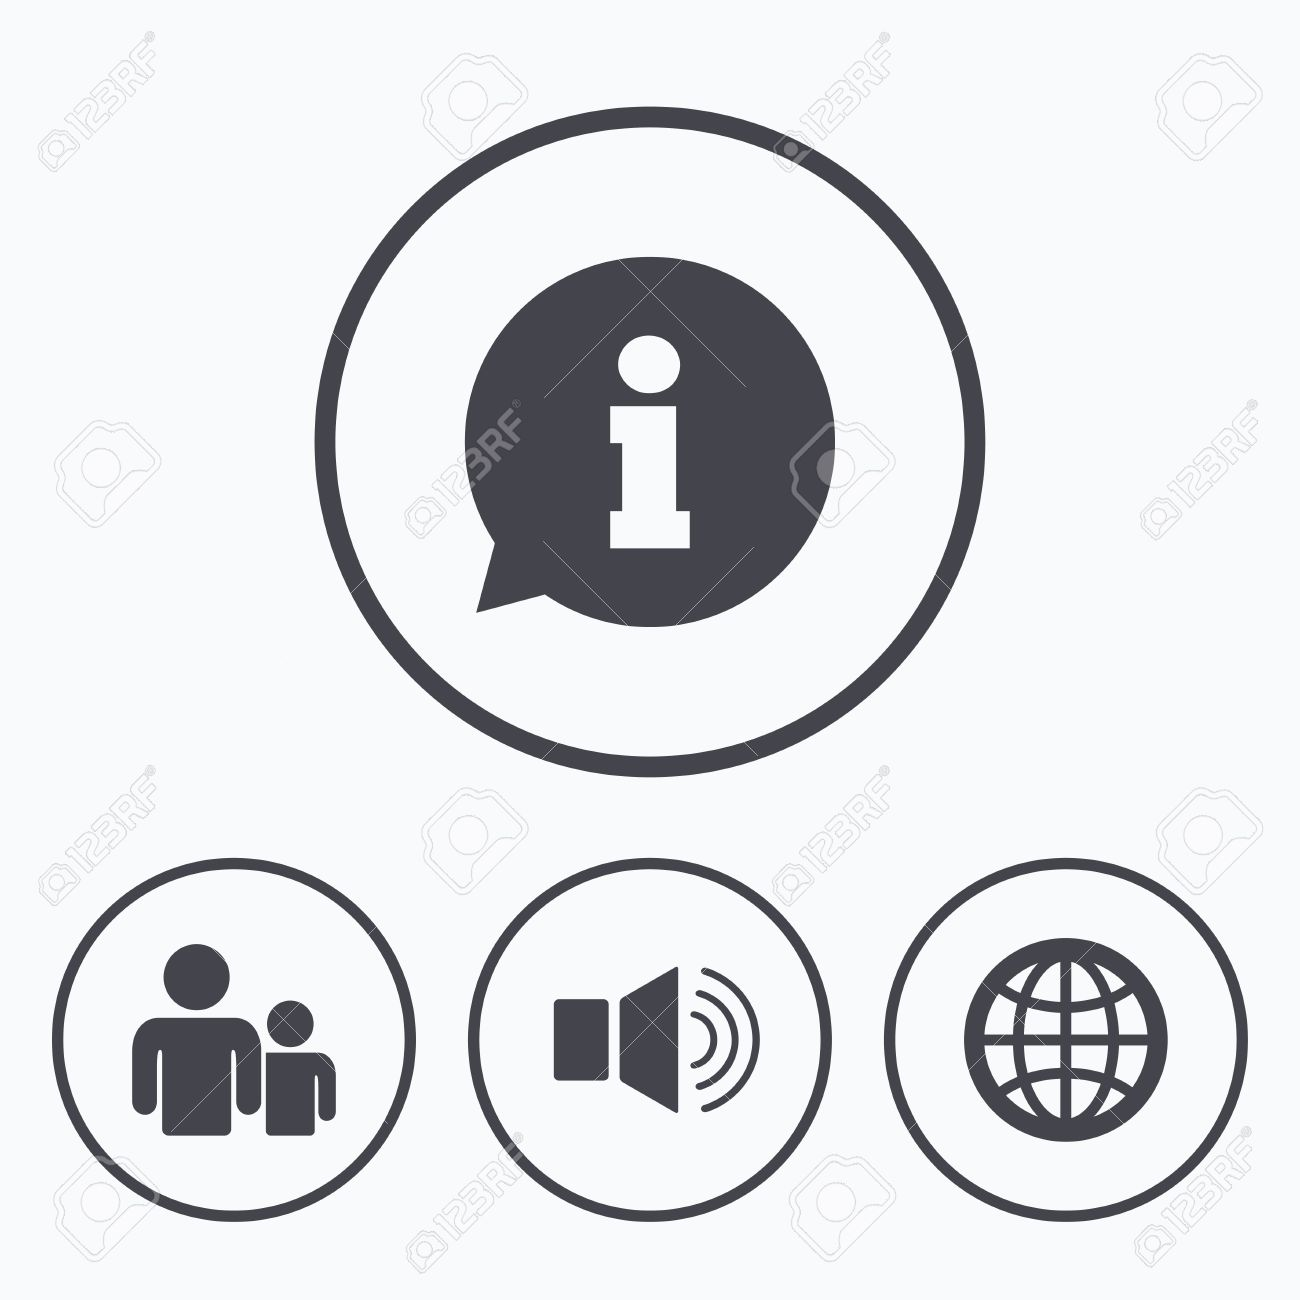 Information Sign Group Of People And Speaker Volume Symbols